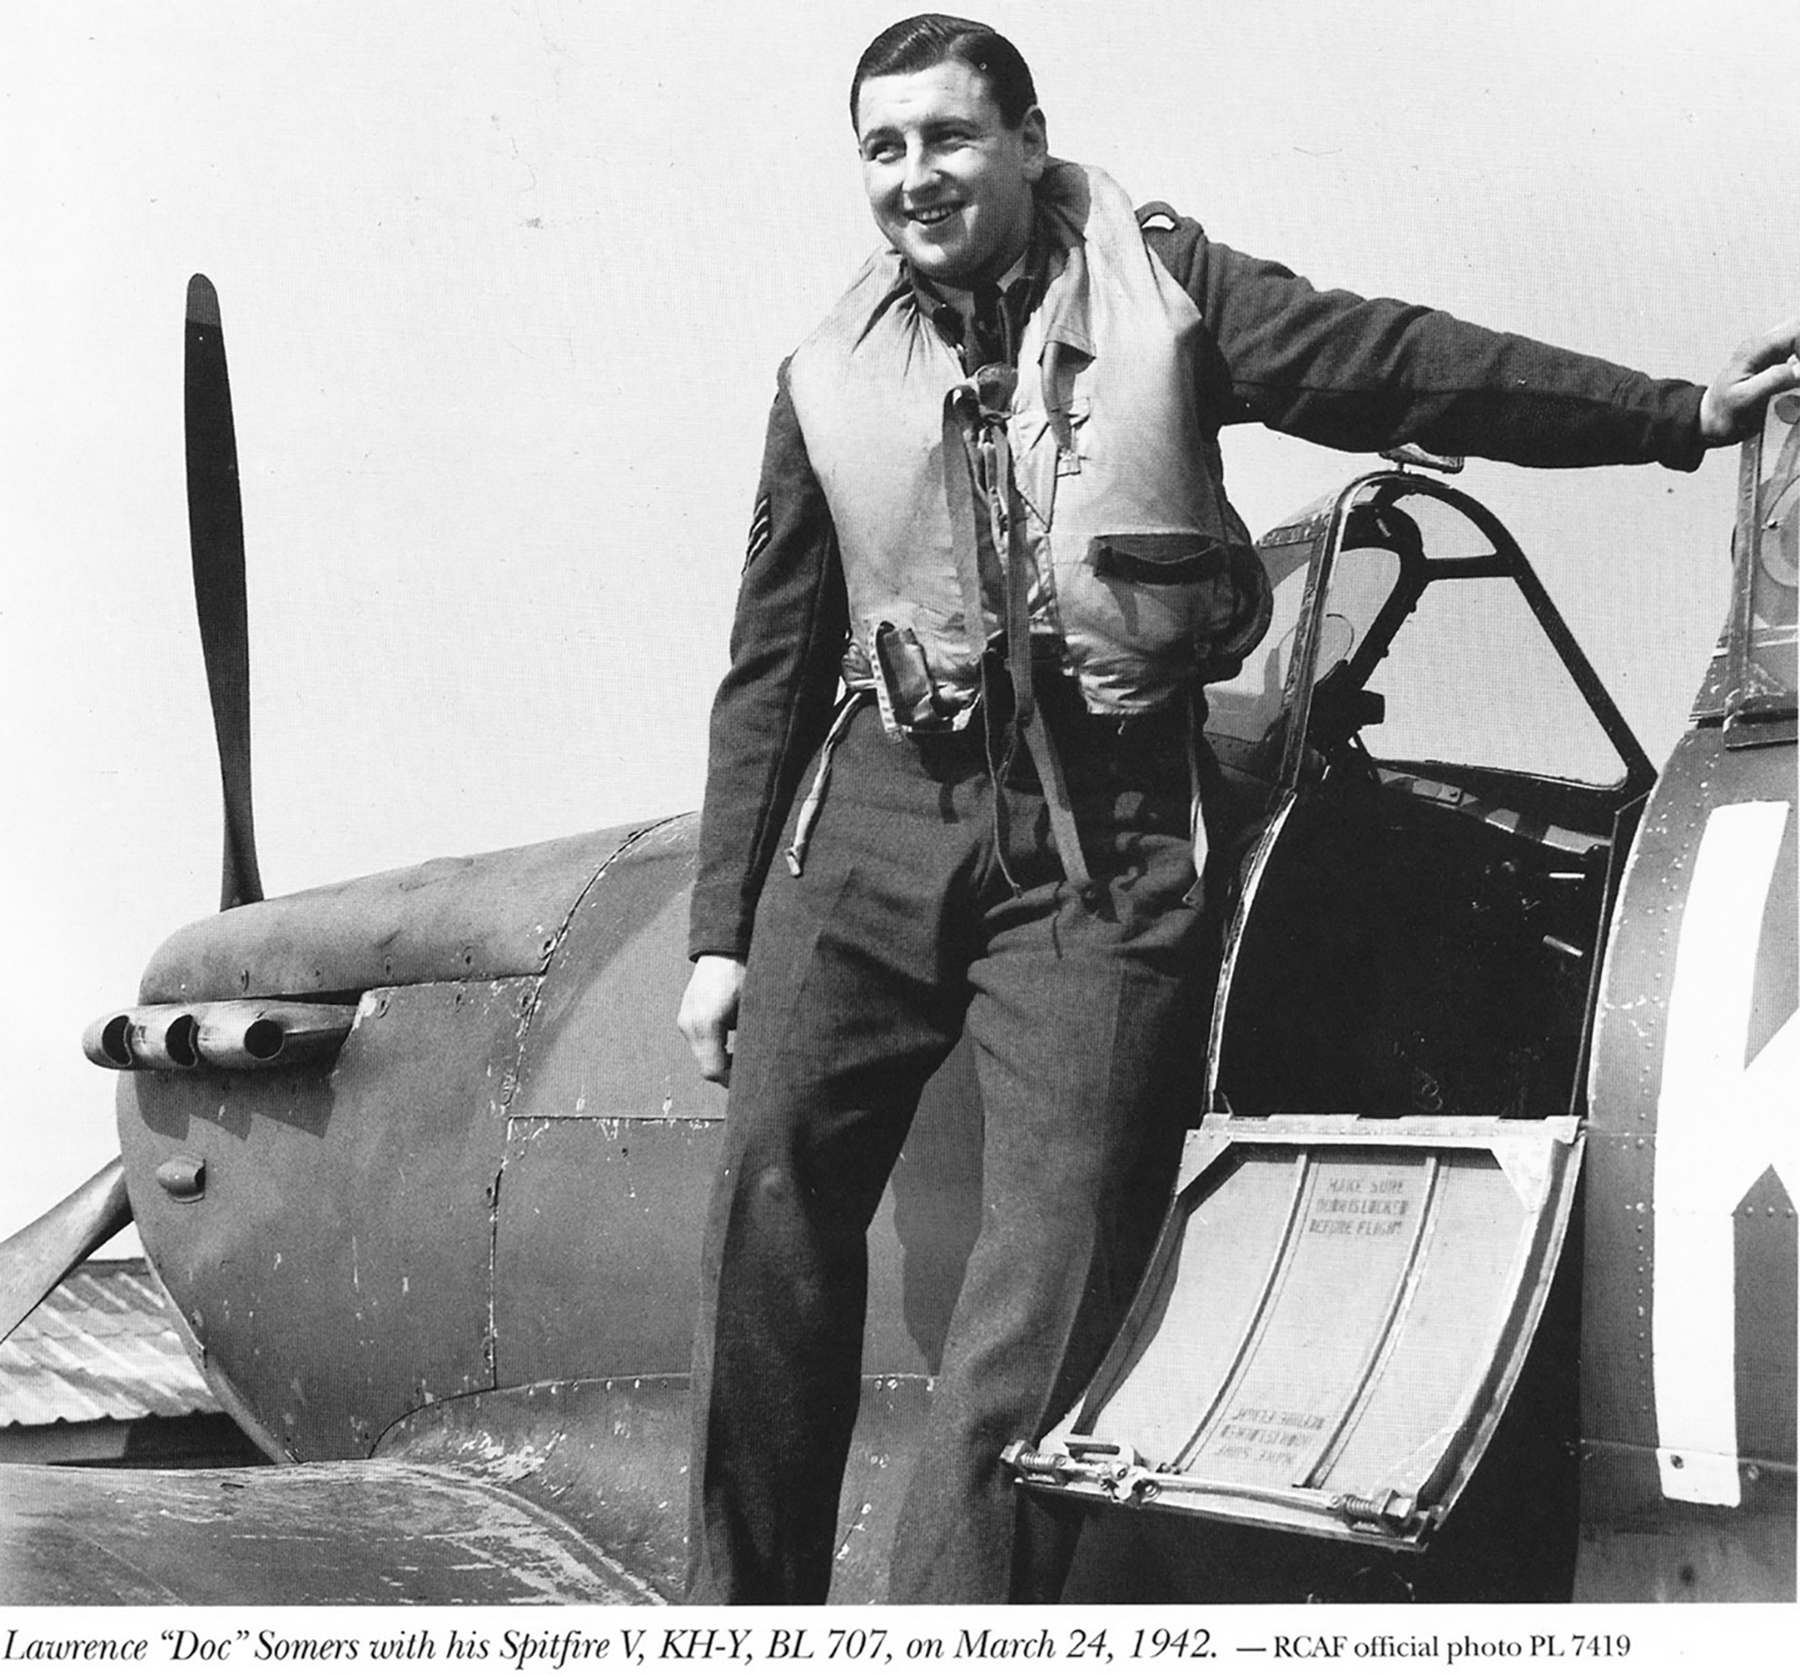 Spitfire MkVb RCAF 403Sqn KHY Lawrence Somers BL707 24th Mar 1942 01